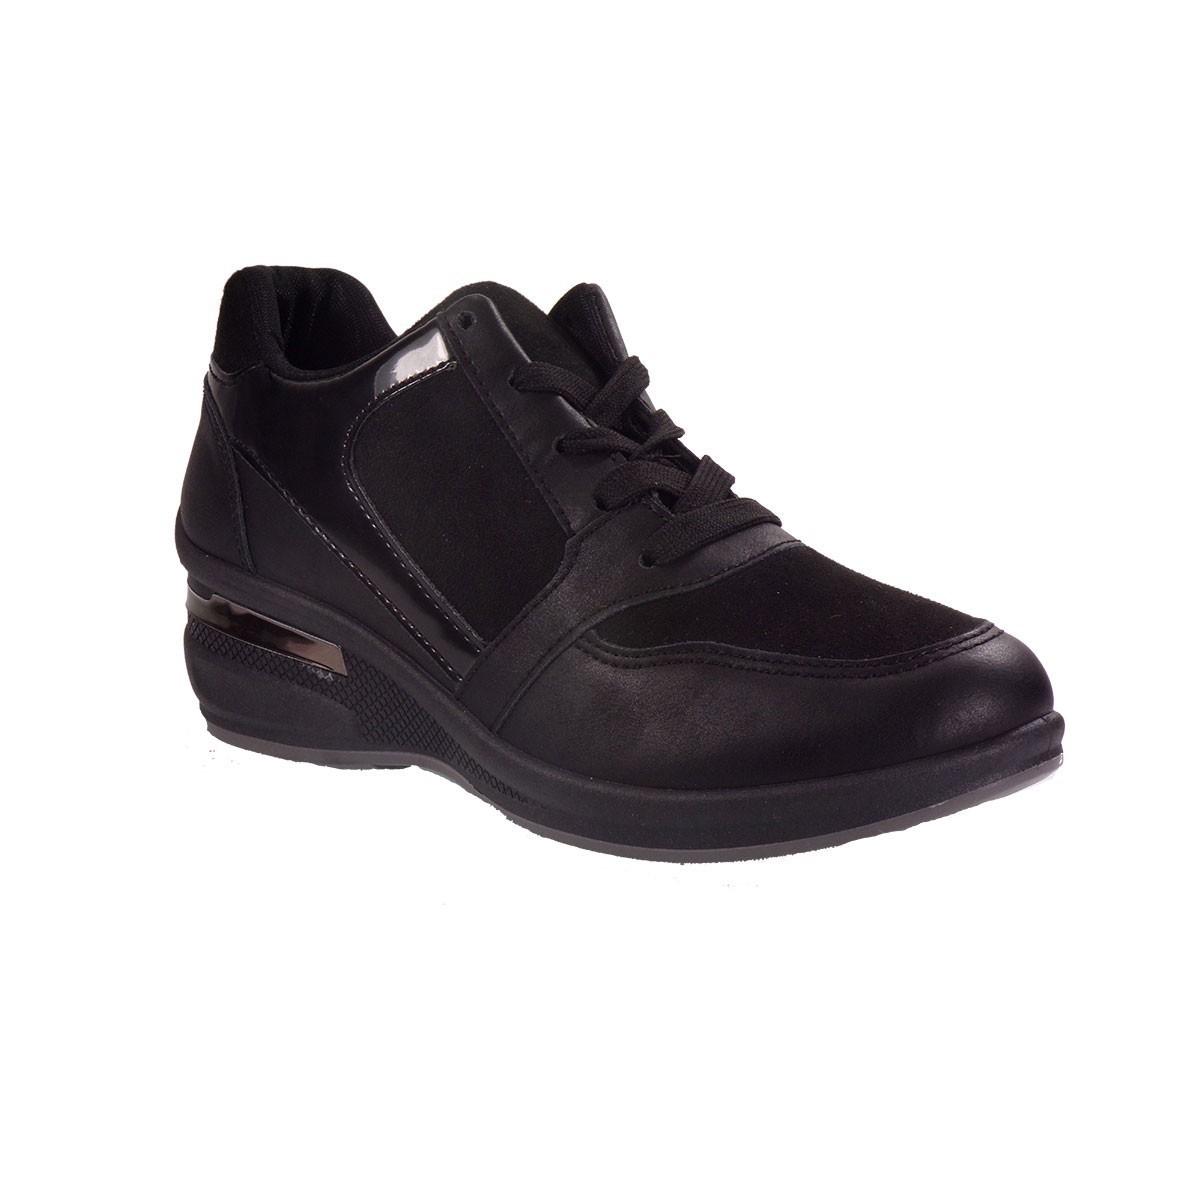 MISS NV Γυναικεία Παπούτσια Sneakers V75-08557 Μαύρο